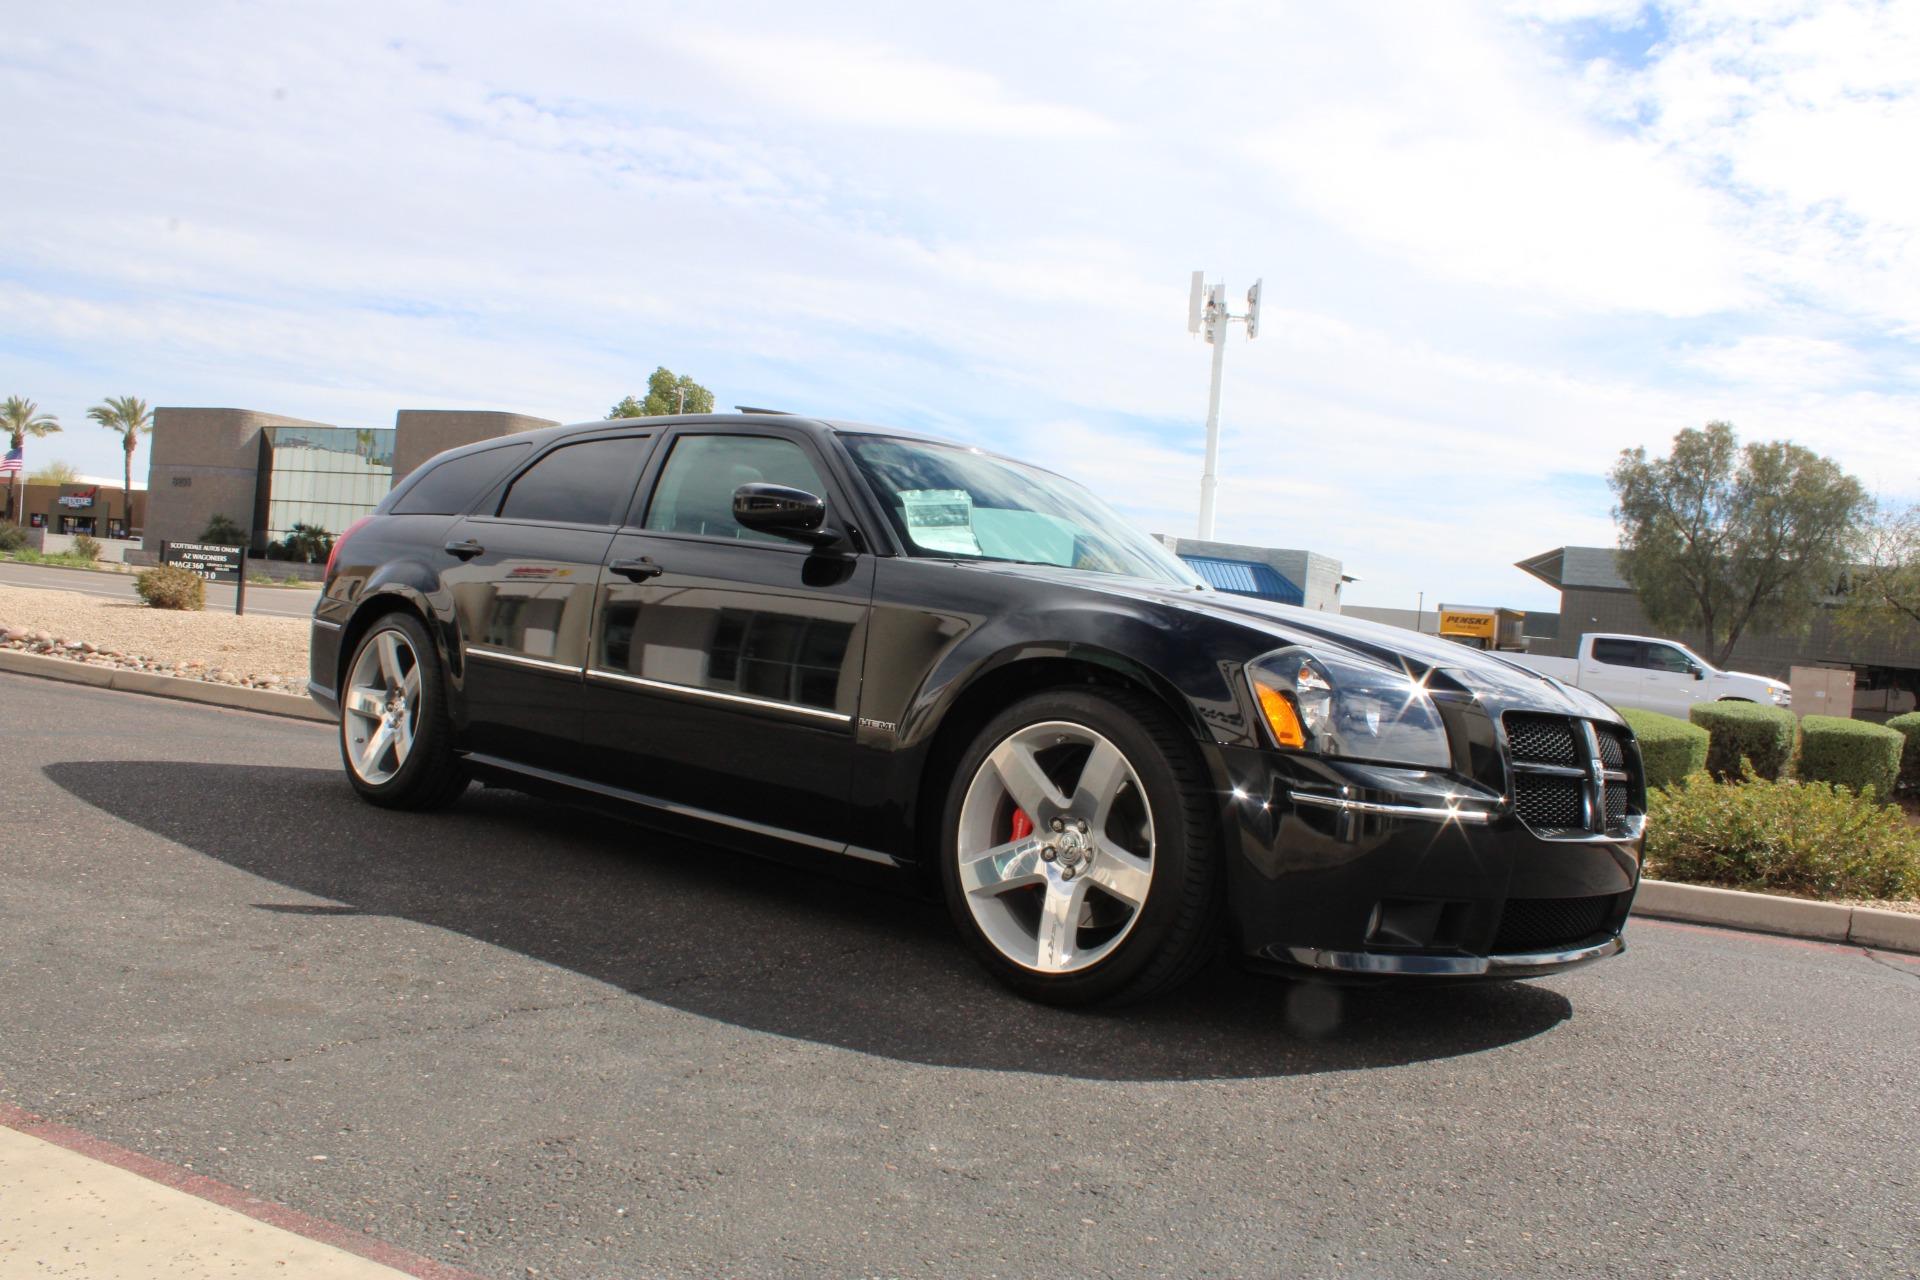 Used-2006-Dodge-Magnum-SRT8-Alfa-Romeo